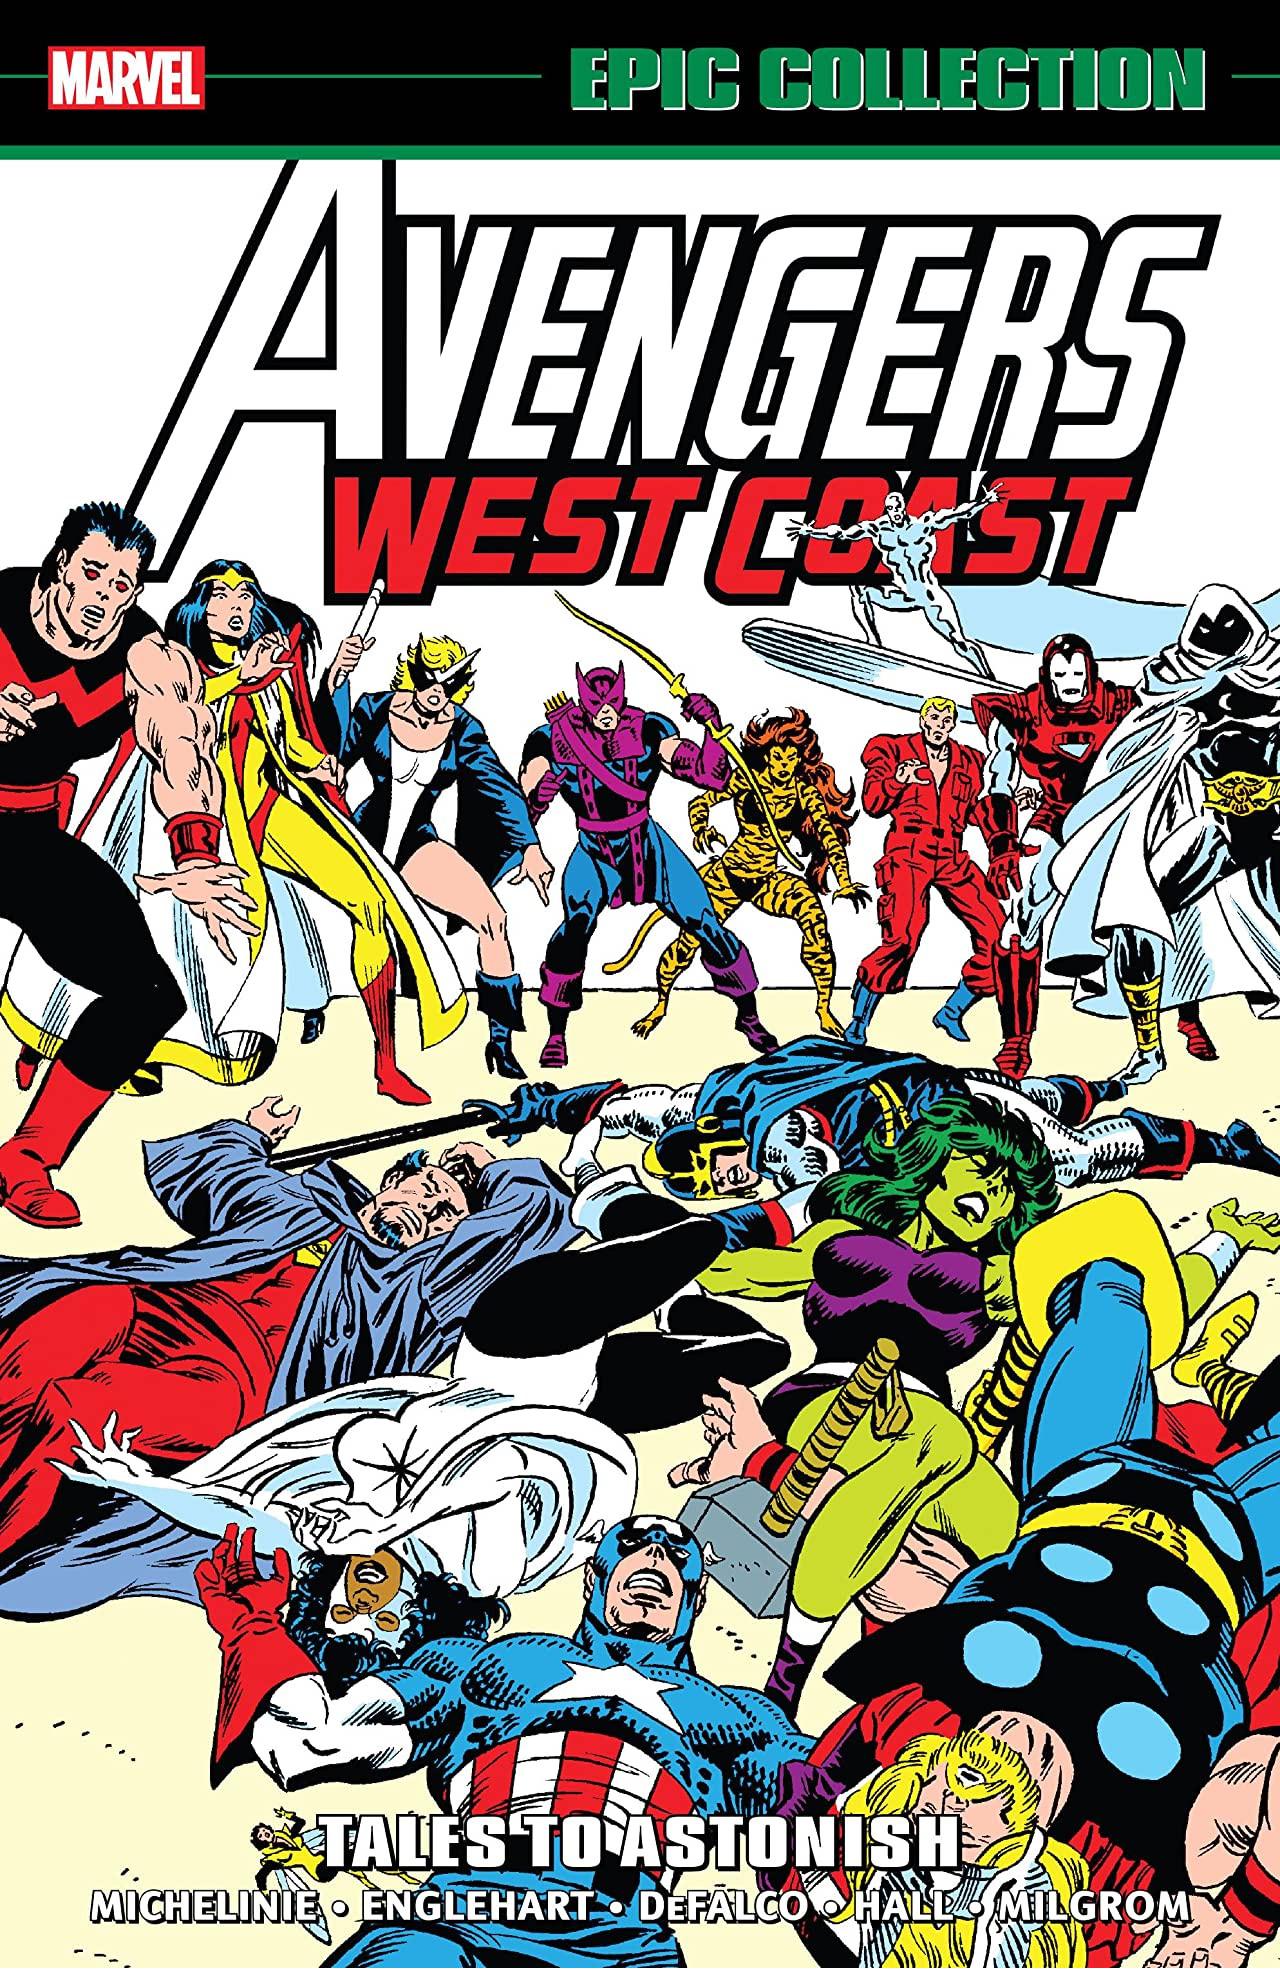 Epic Collection: Avengers West Coast Vol 1 3